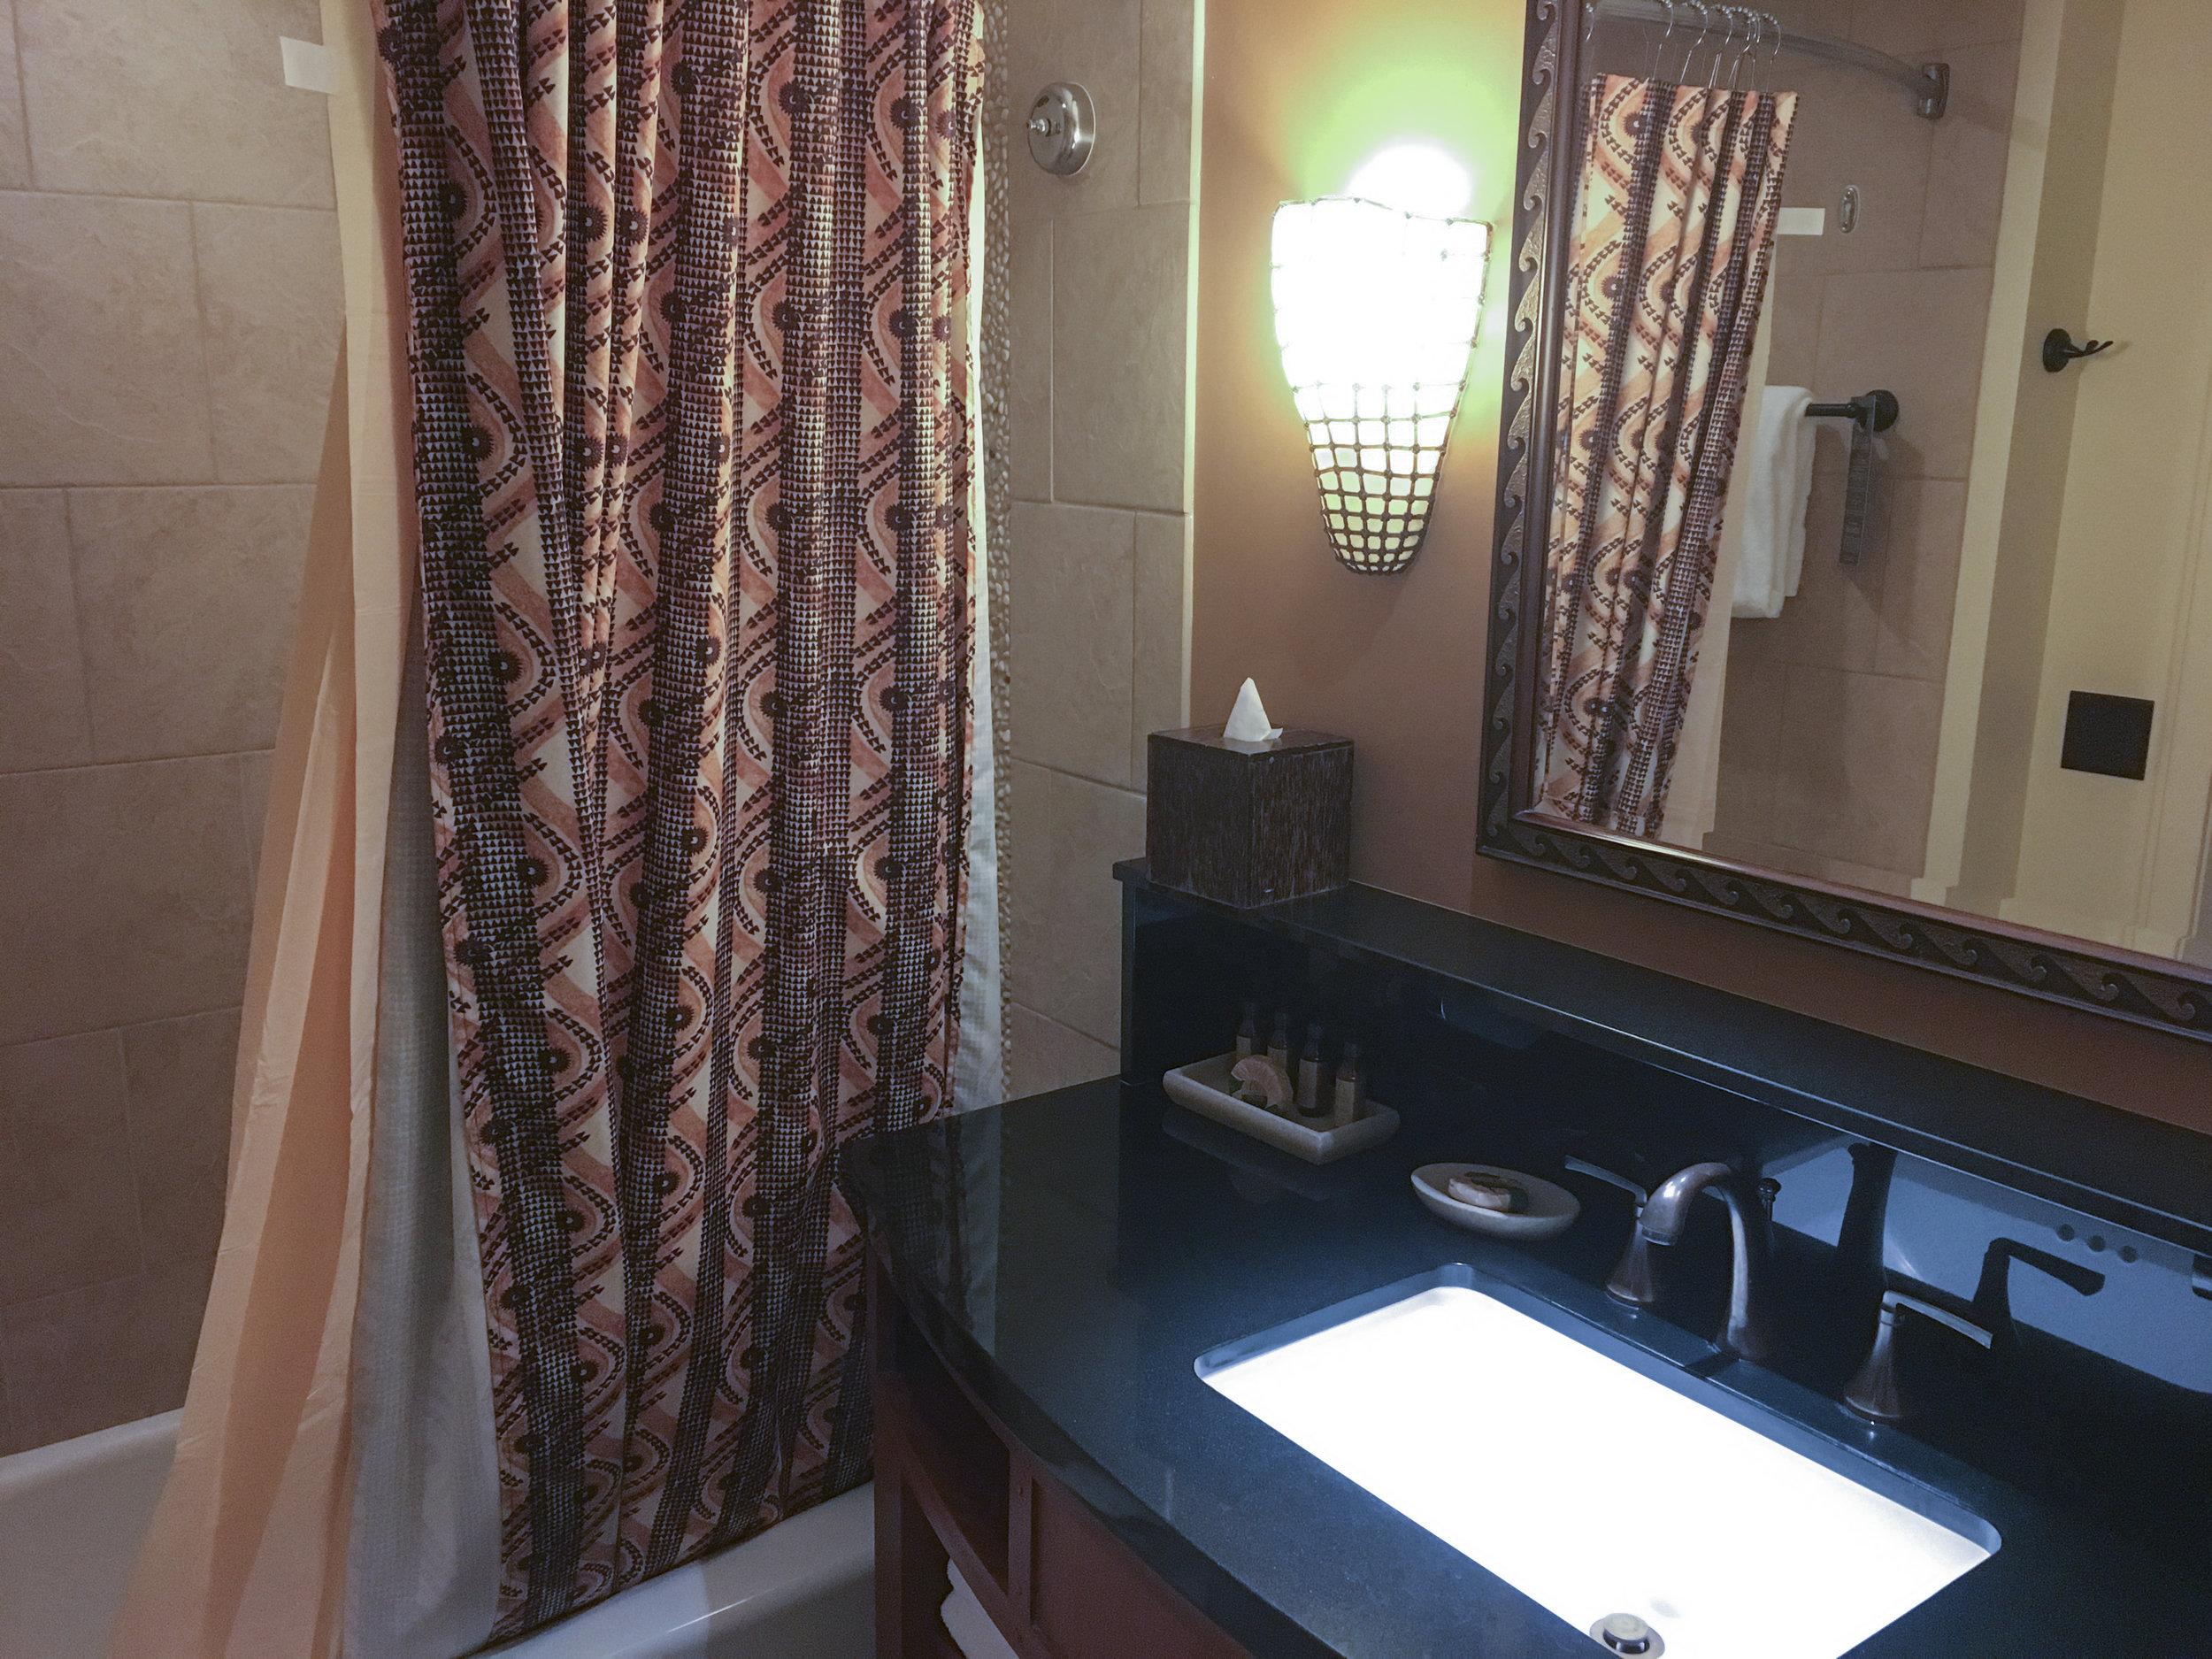 disney_dinks_aulani_bathroom_1.jpg